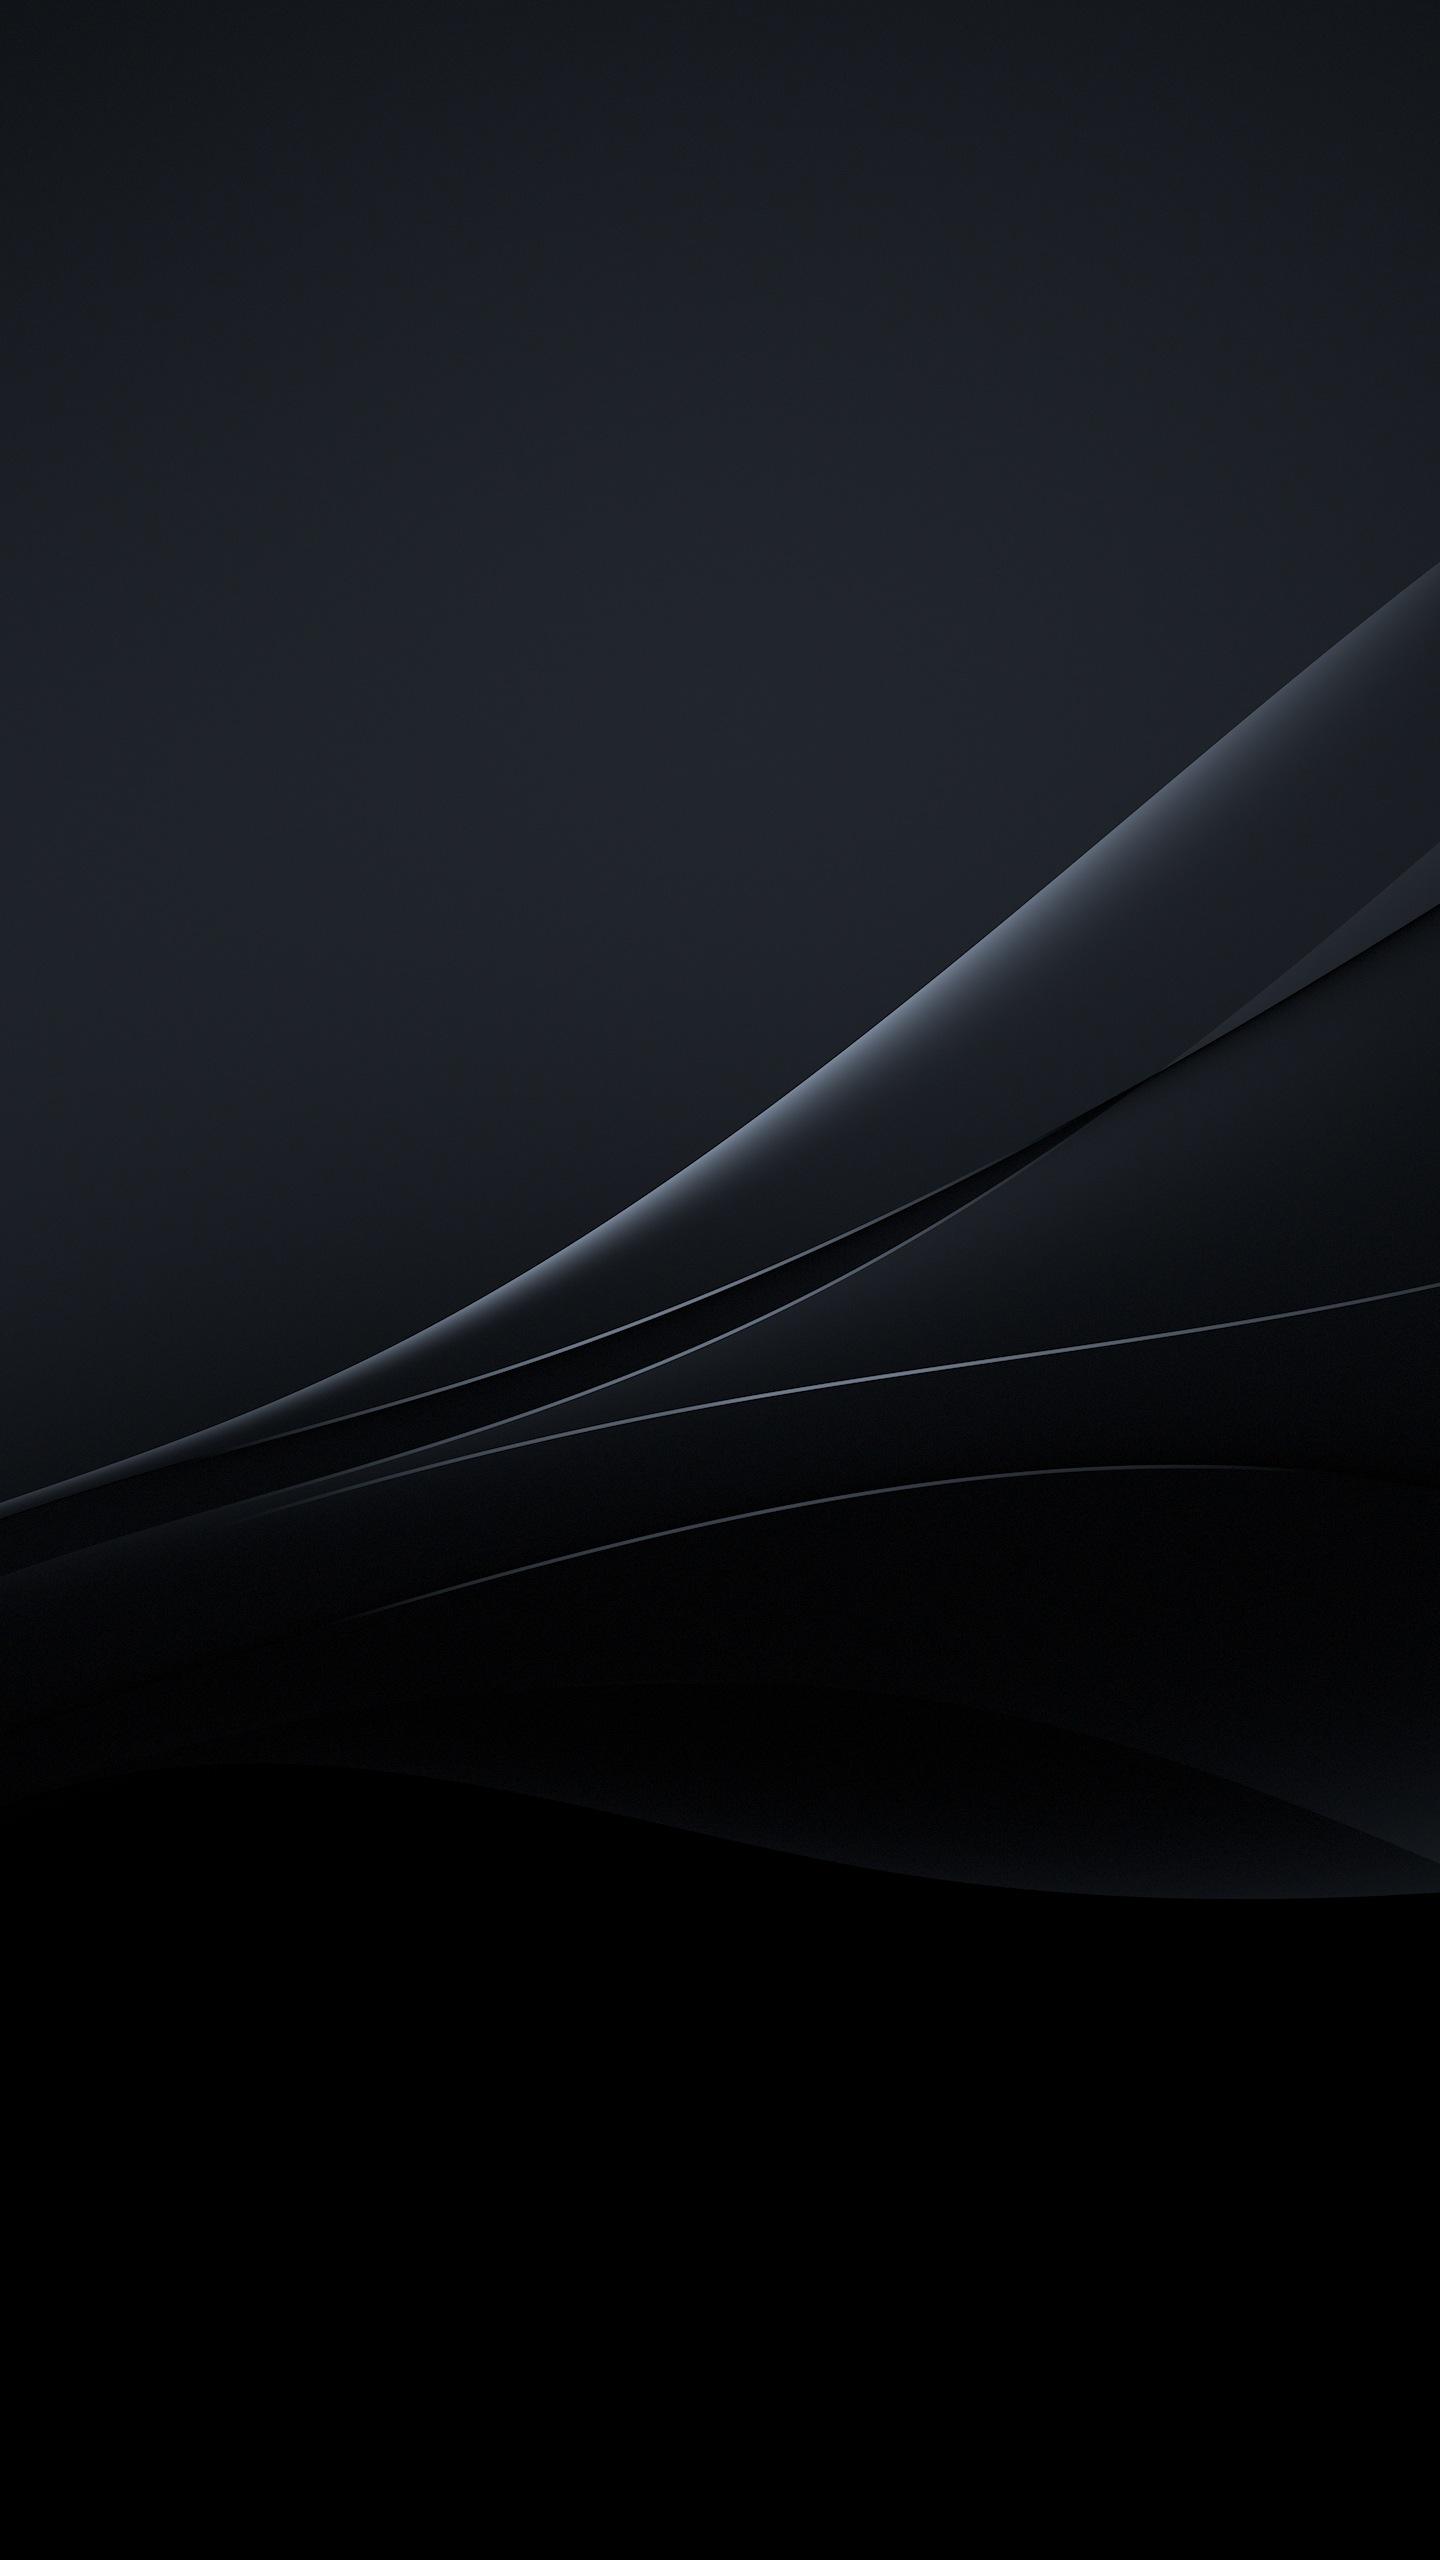 Sony Xperia Z5 Wallpaper Wallpapersafari